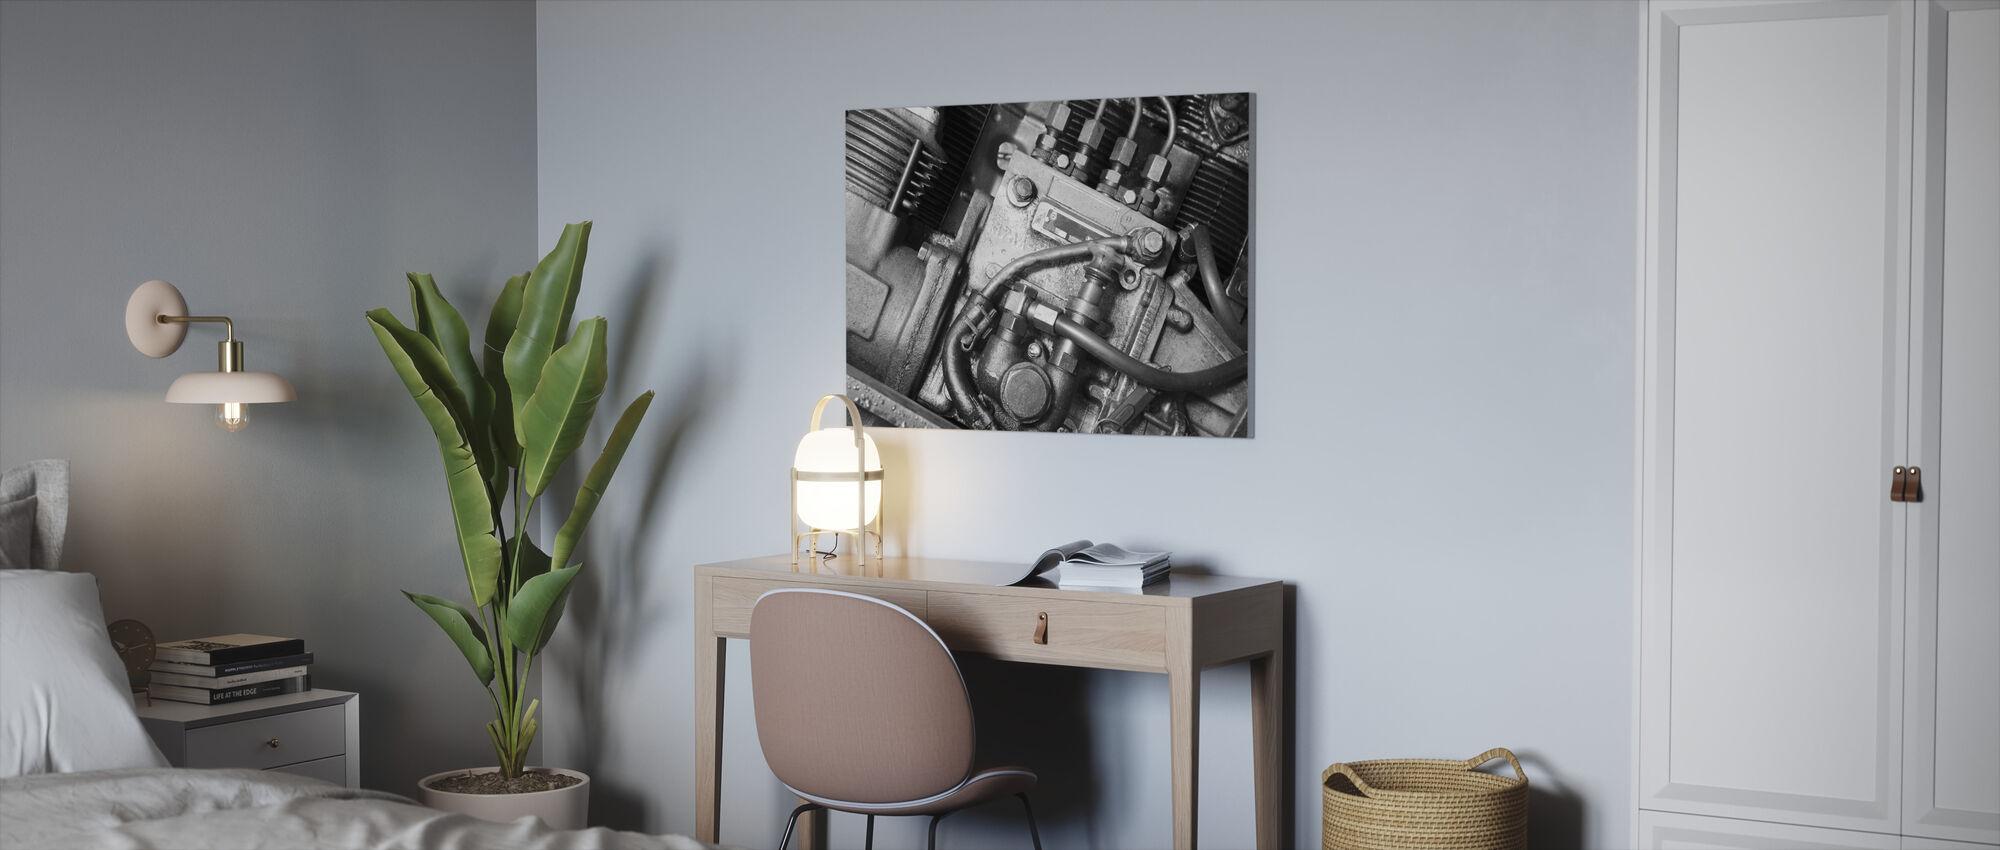 Car Engine - Monochrome - Canvas print - Office